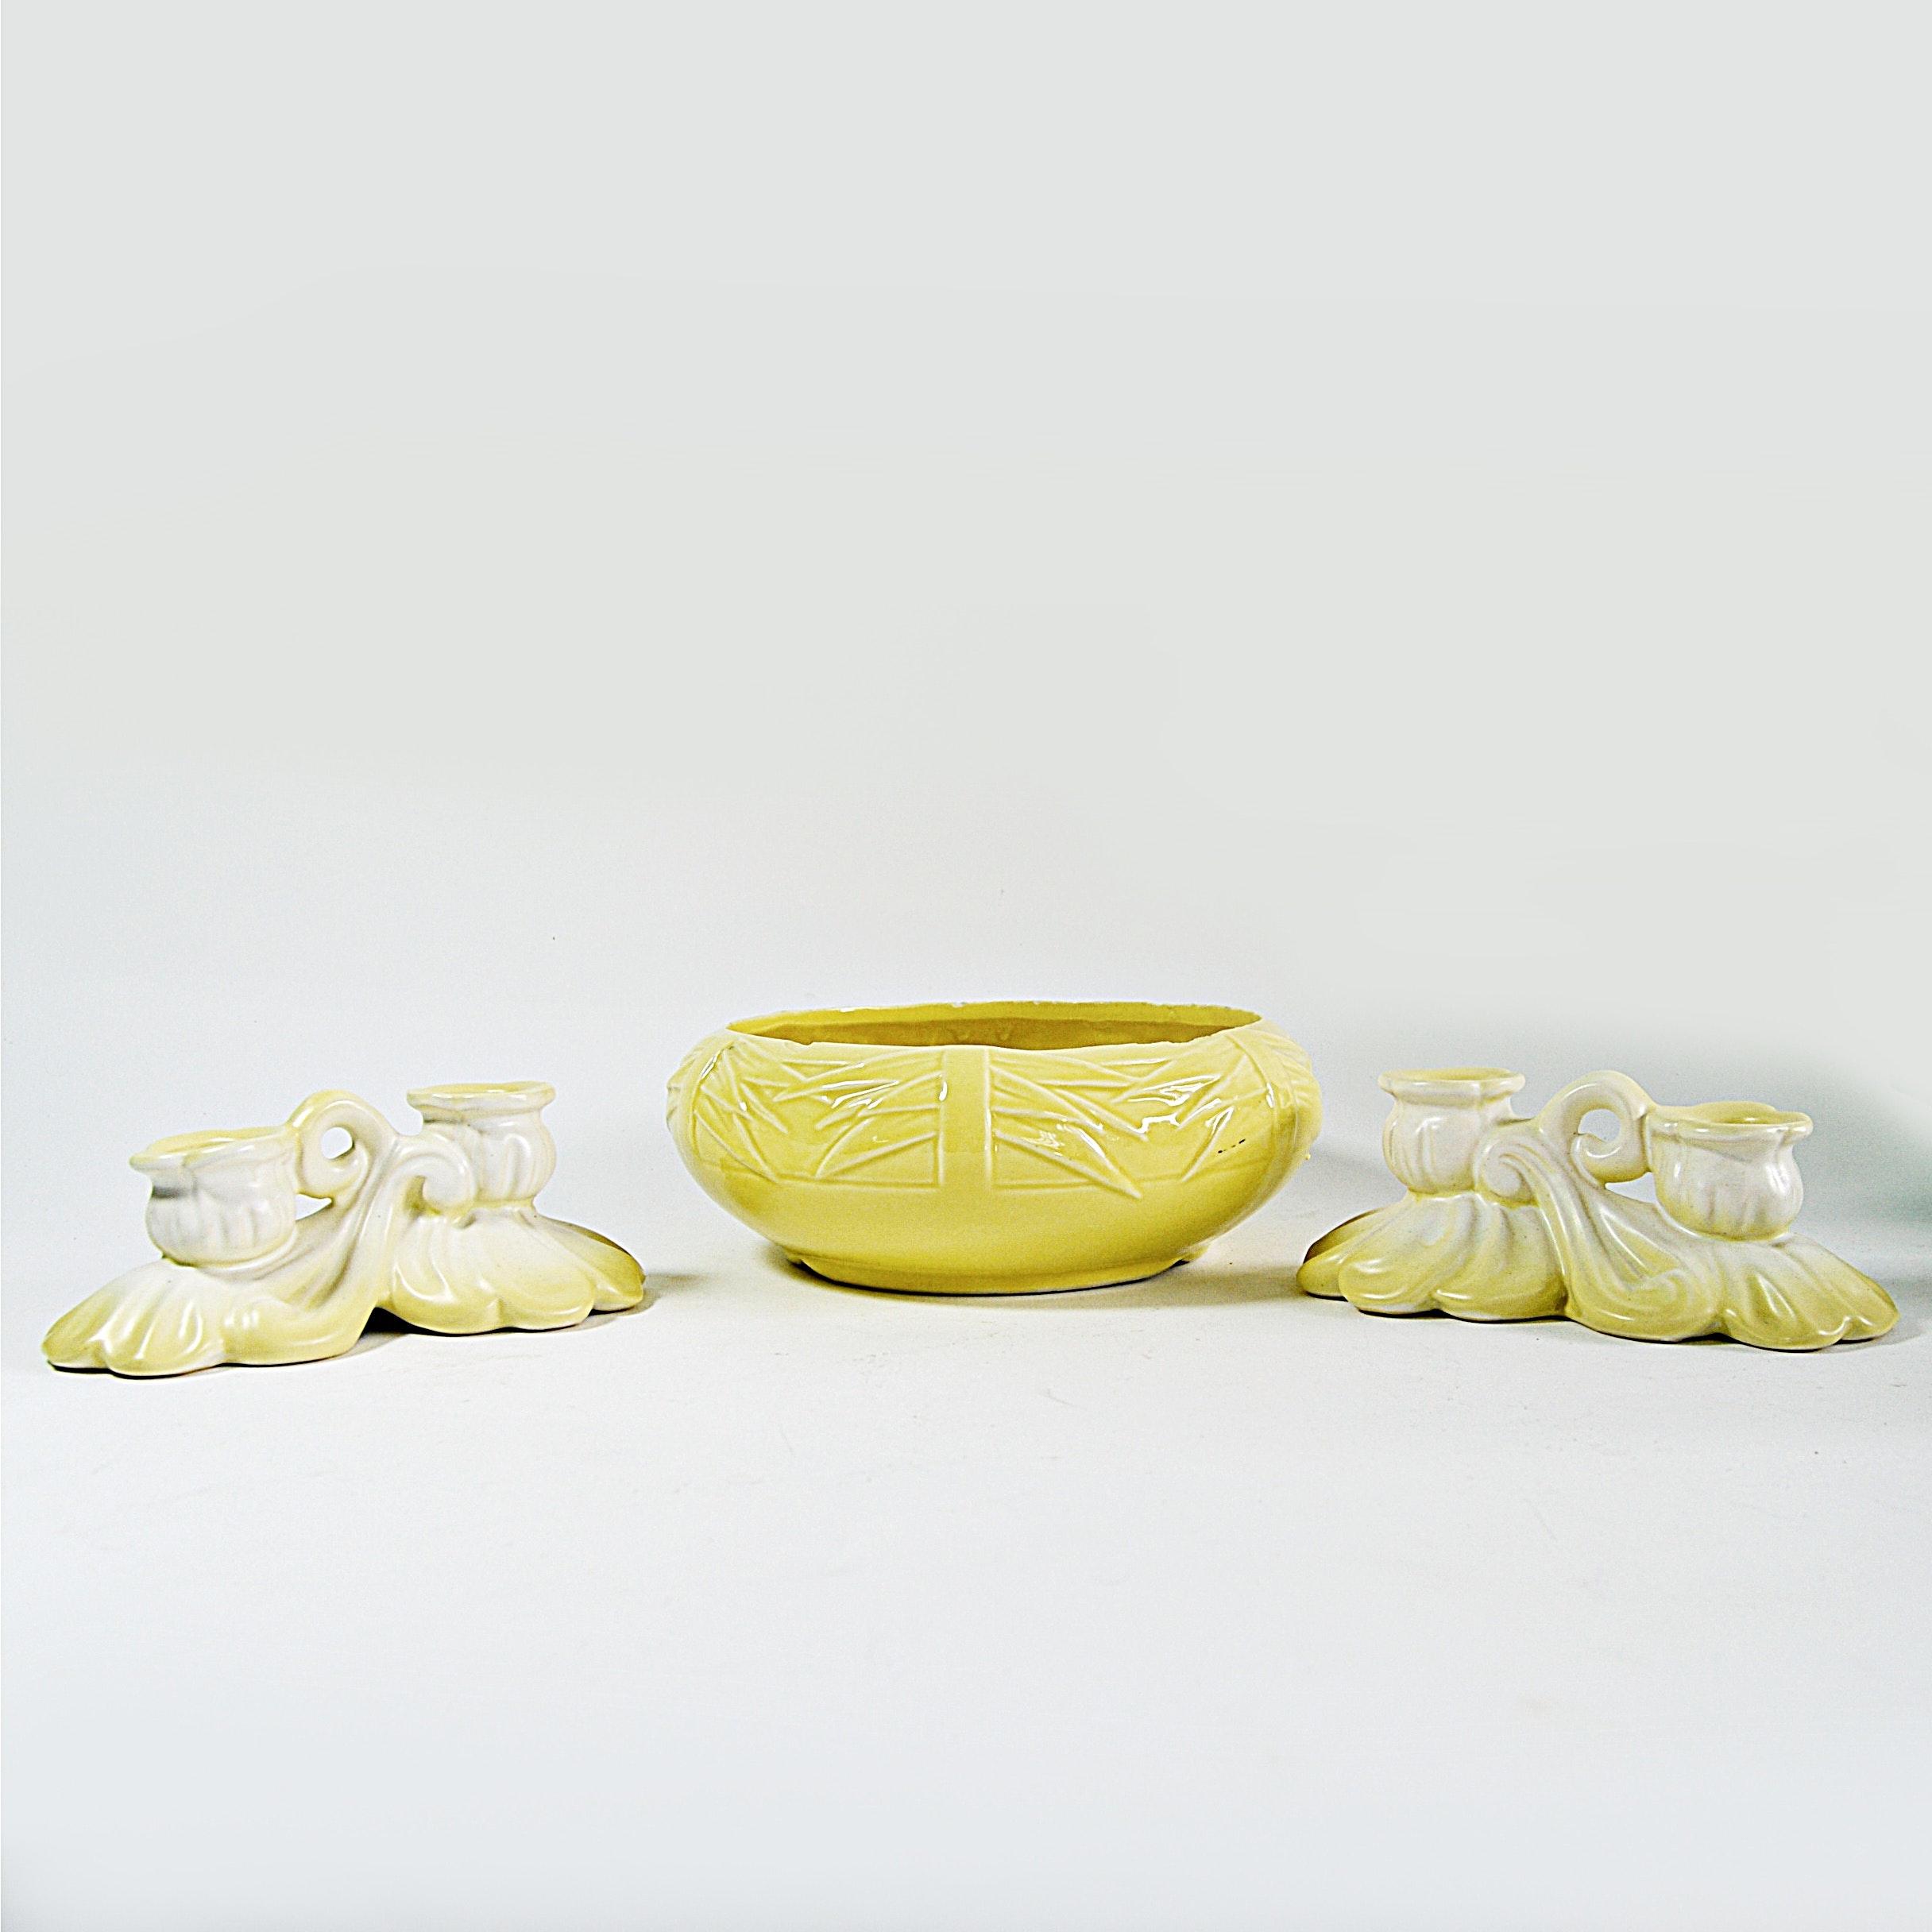 Vintage Weller Pottery Candleholders and McCoy Bowl